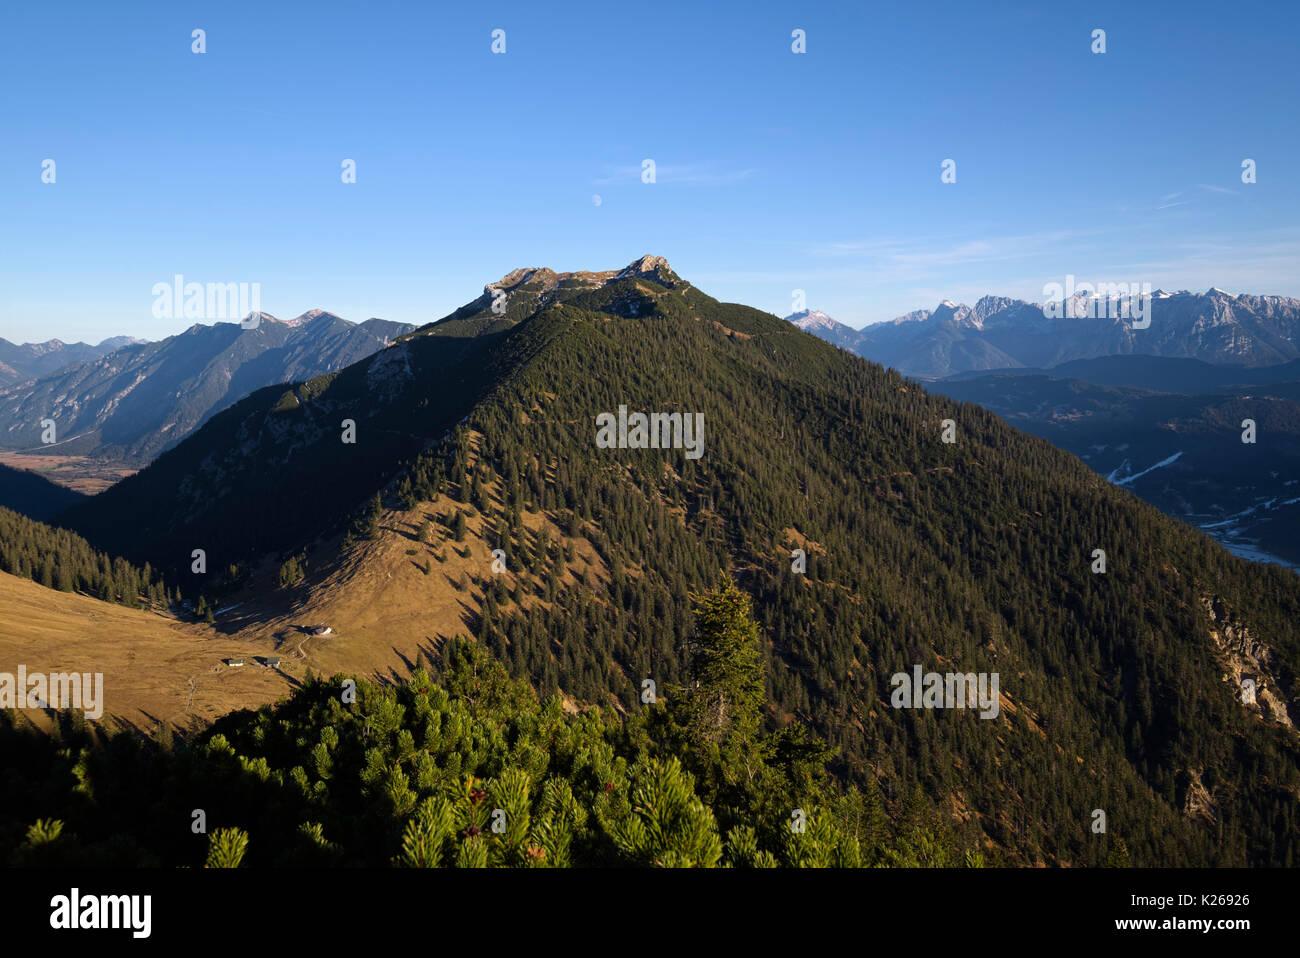 view of Stepberg alp and mountain Kramerspitz, Bavaria, Germany - Stock Image